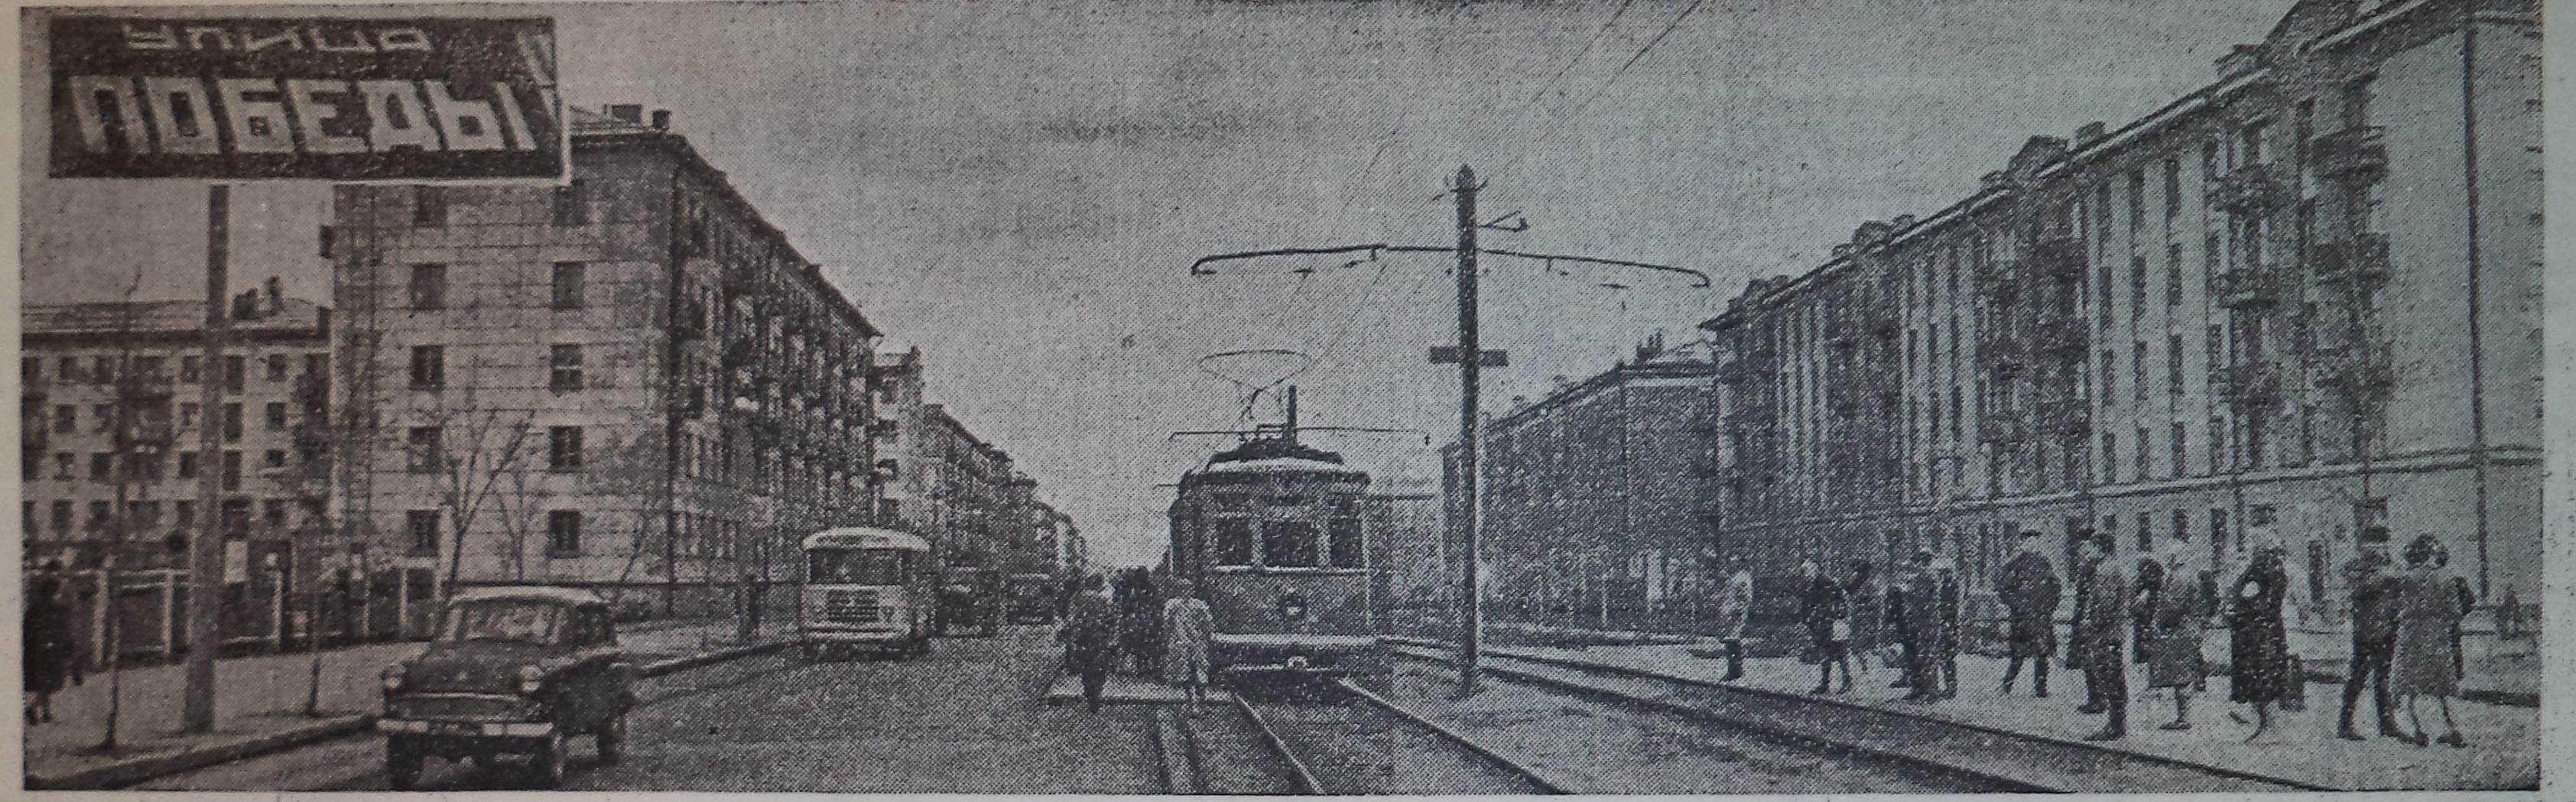 Победы-ФОТО-85-ВКц-1965-05-09-фото с ул. Поб.